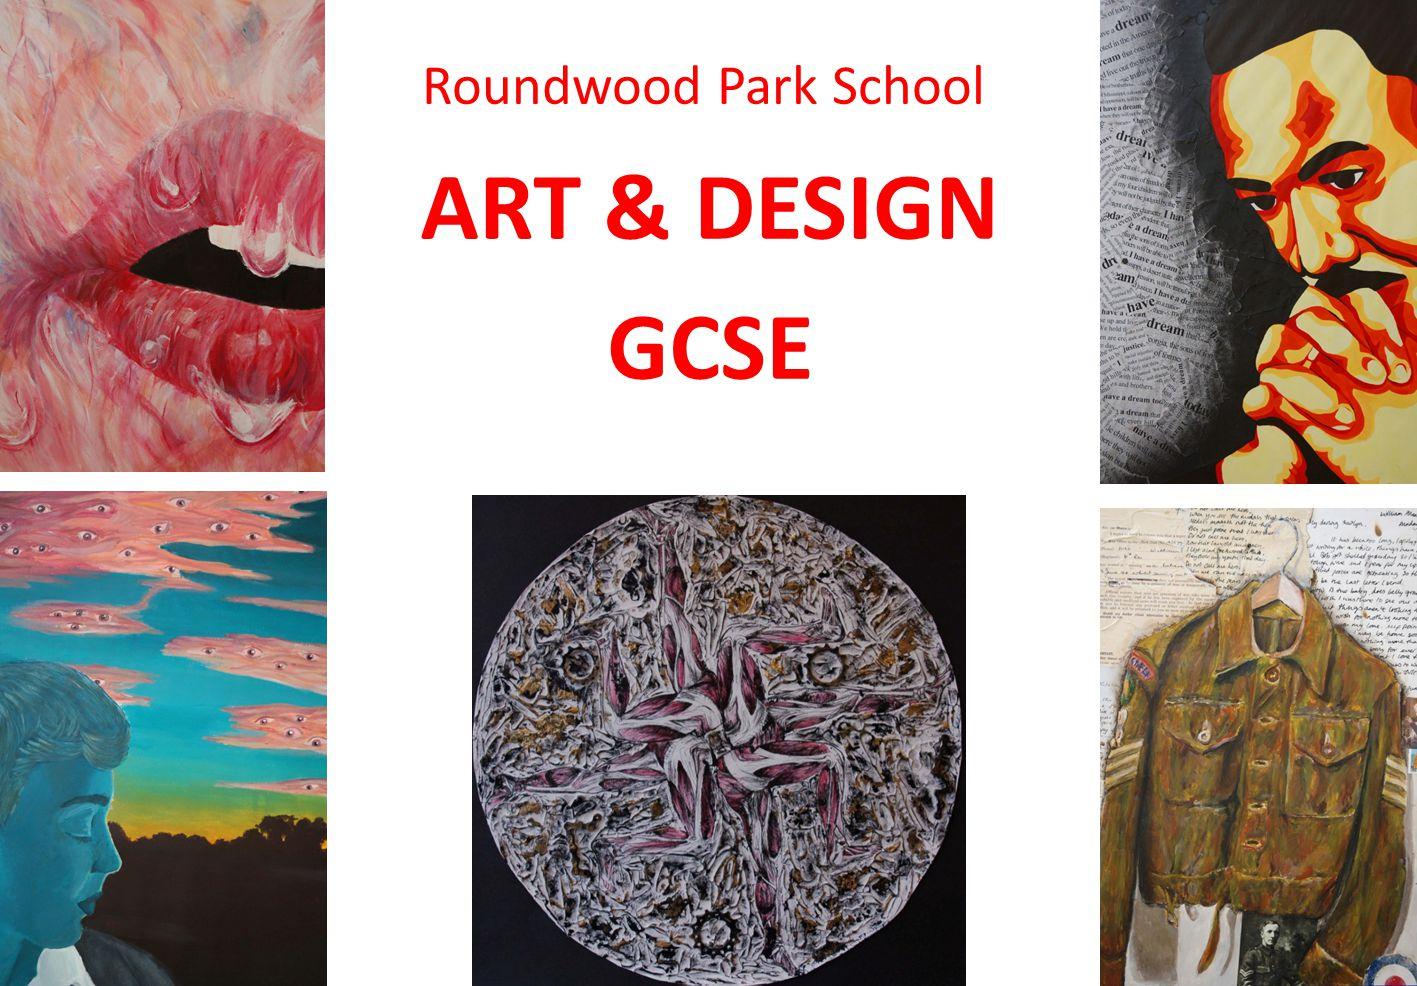 Roundwood Park School ART & DESIGN GCSE